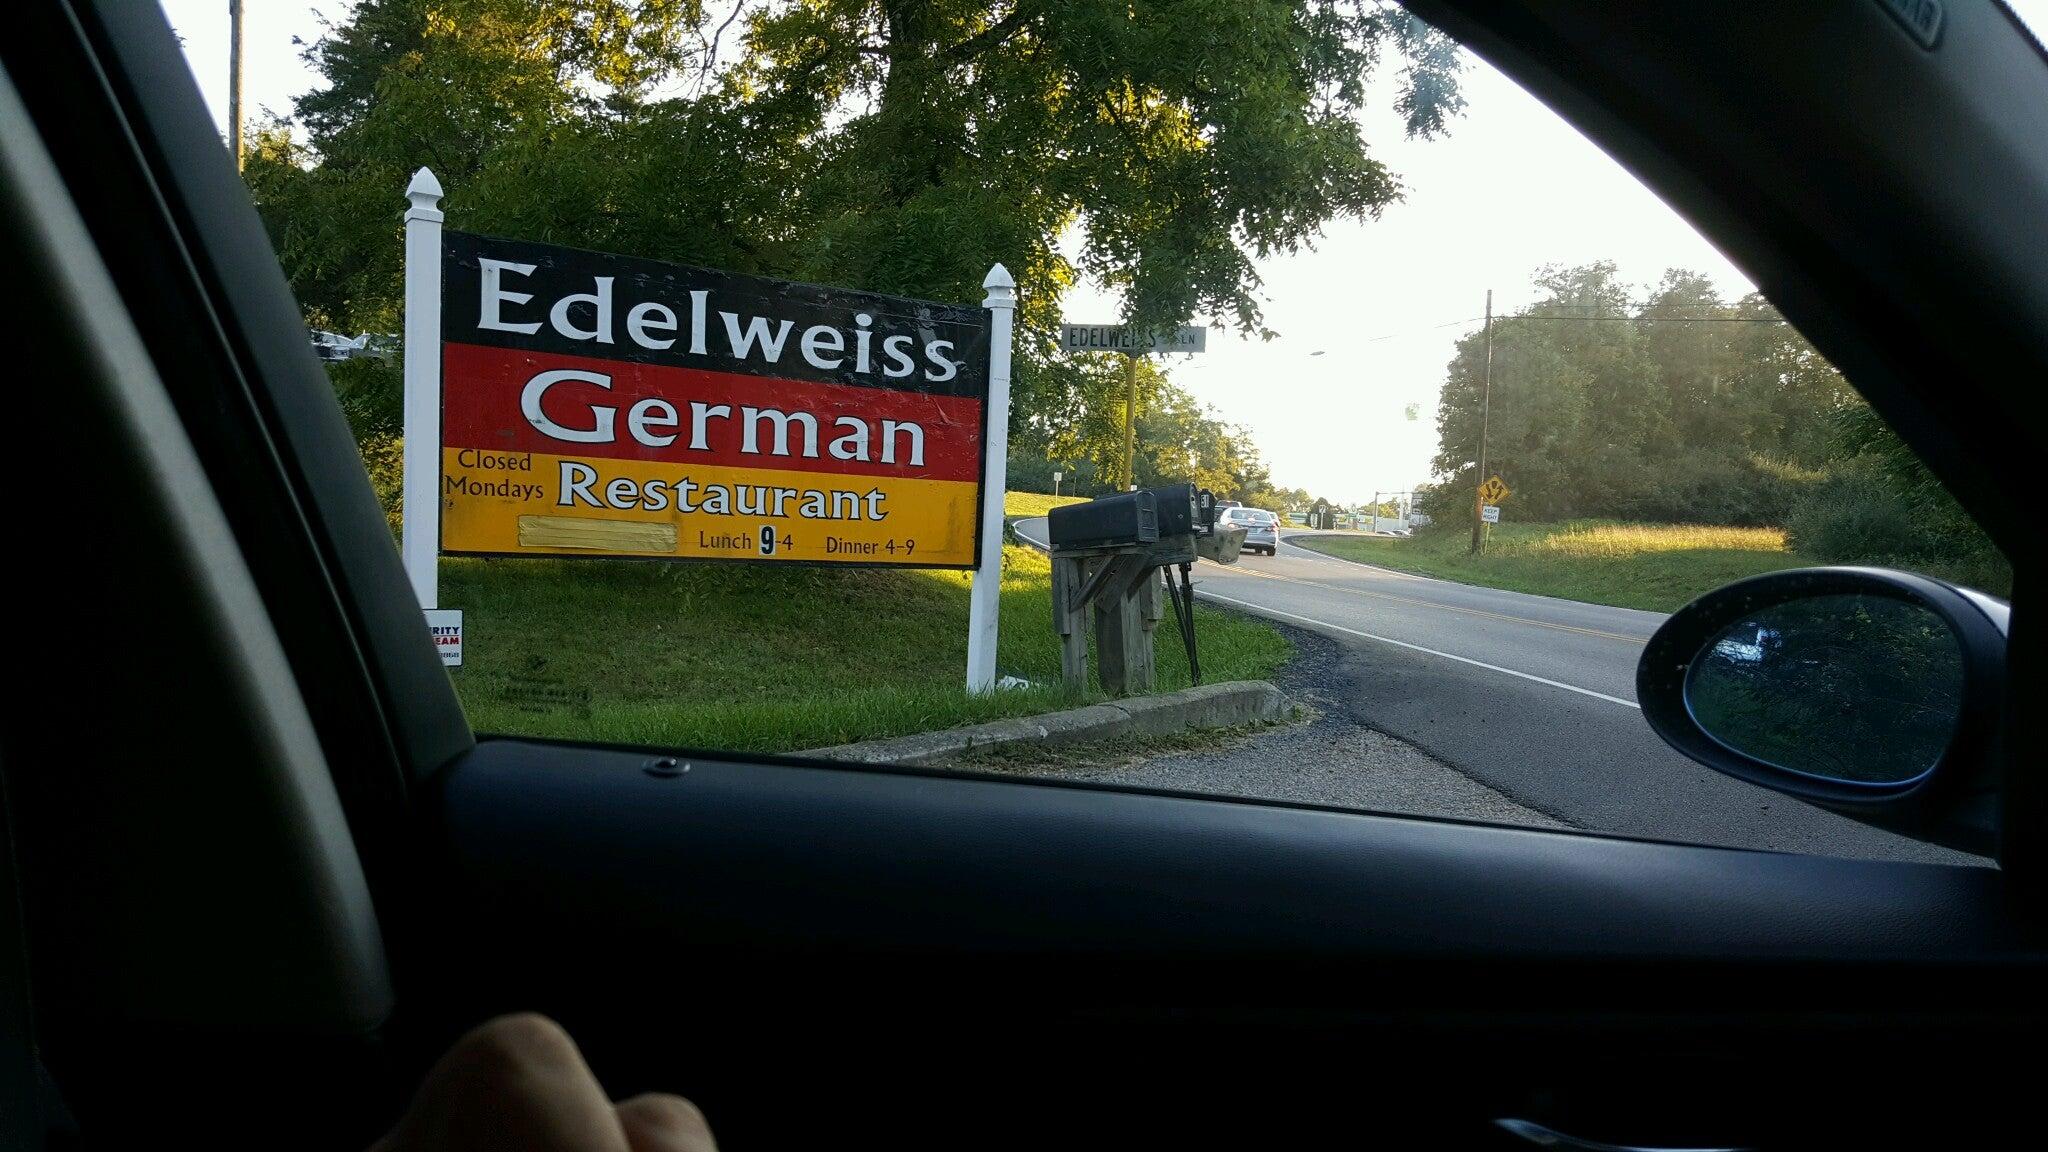 EDELWEISS GERMAN RESTAURANT,